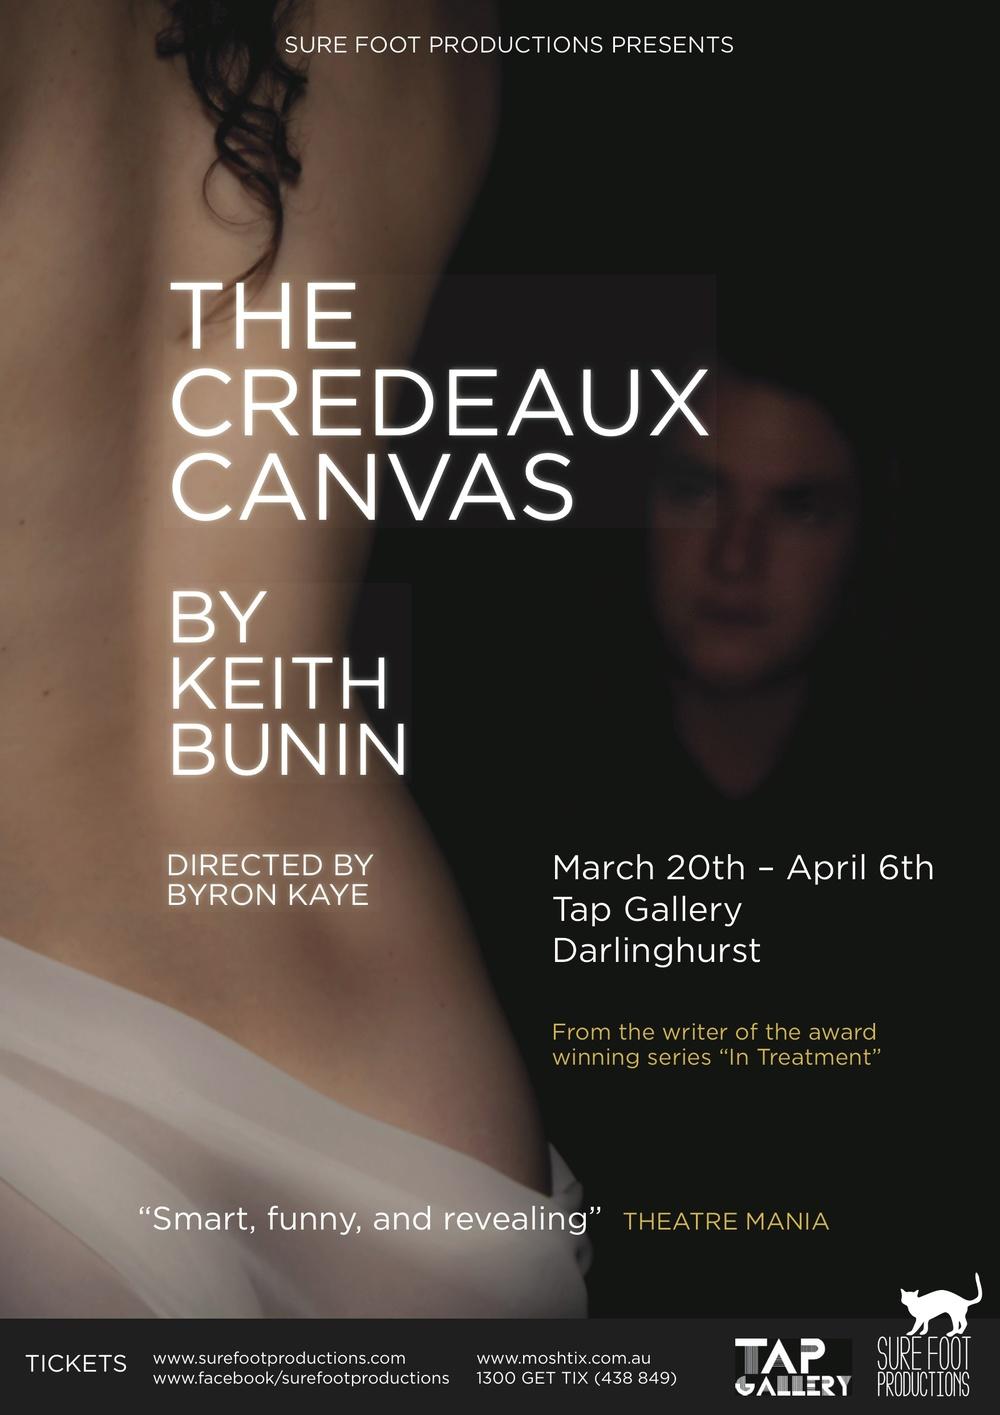 The Credeaux Canvas